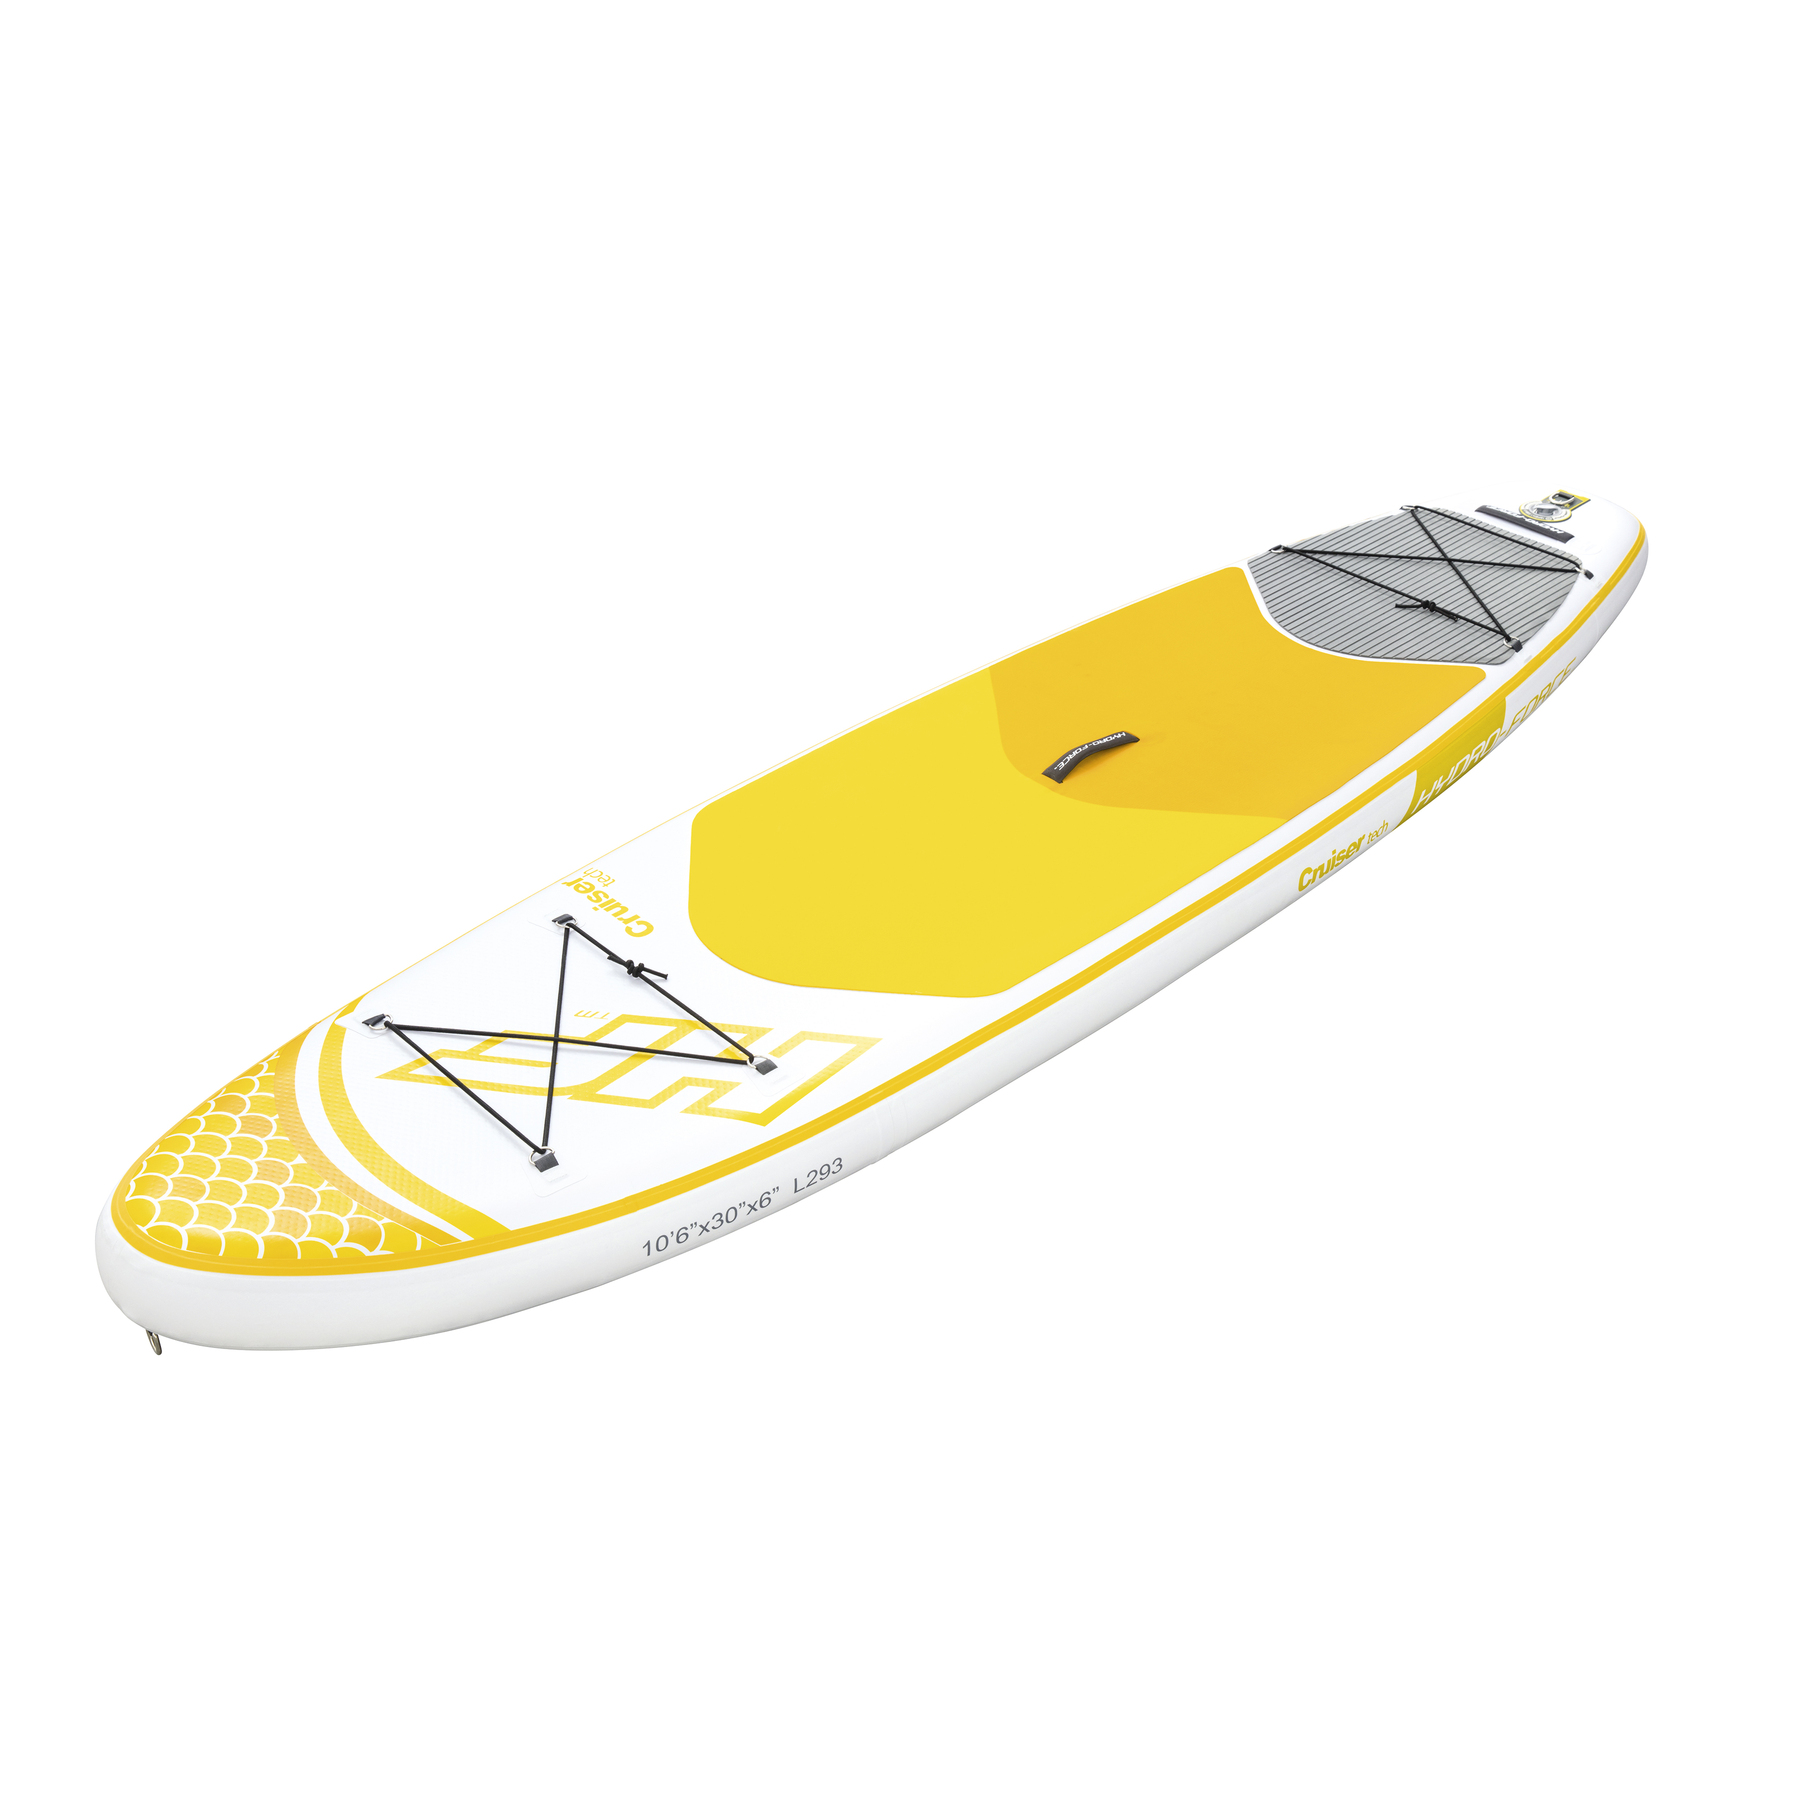 Sup-board Swimming Watersport Dimensions 320 х76х15 Cm, Bestway, Item No. 65305